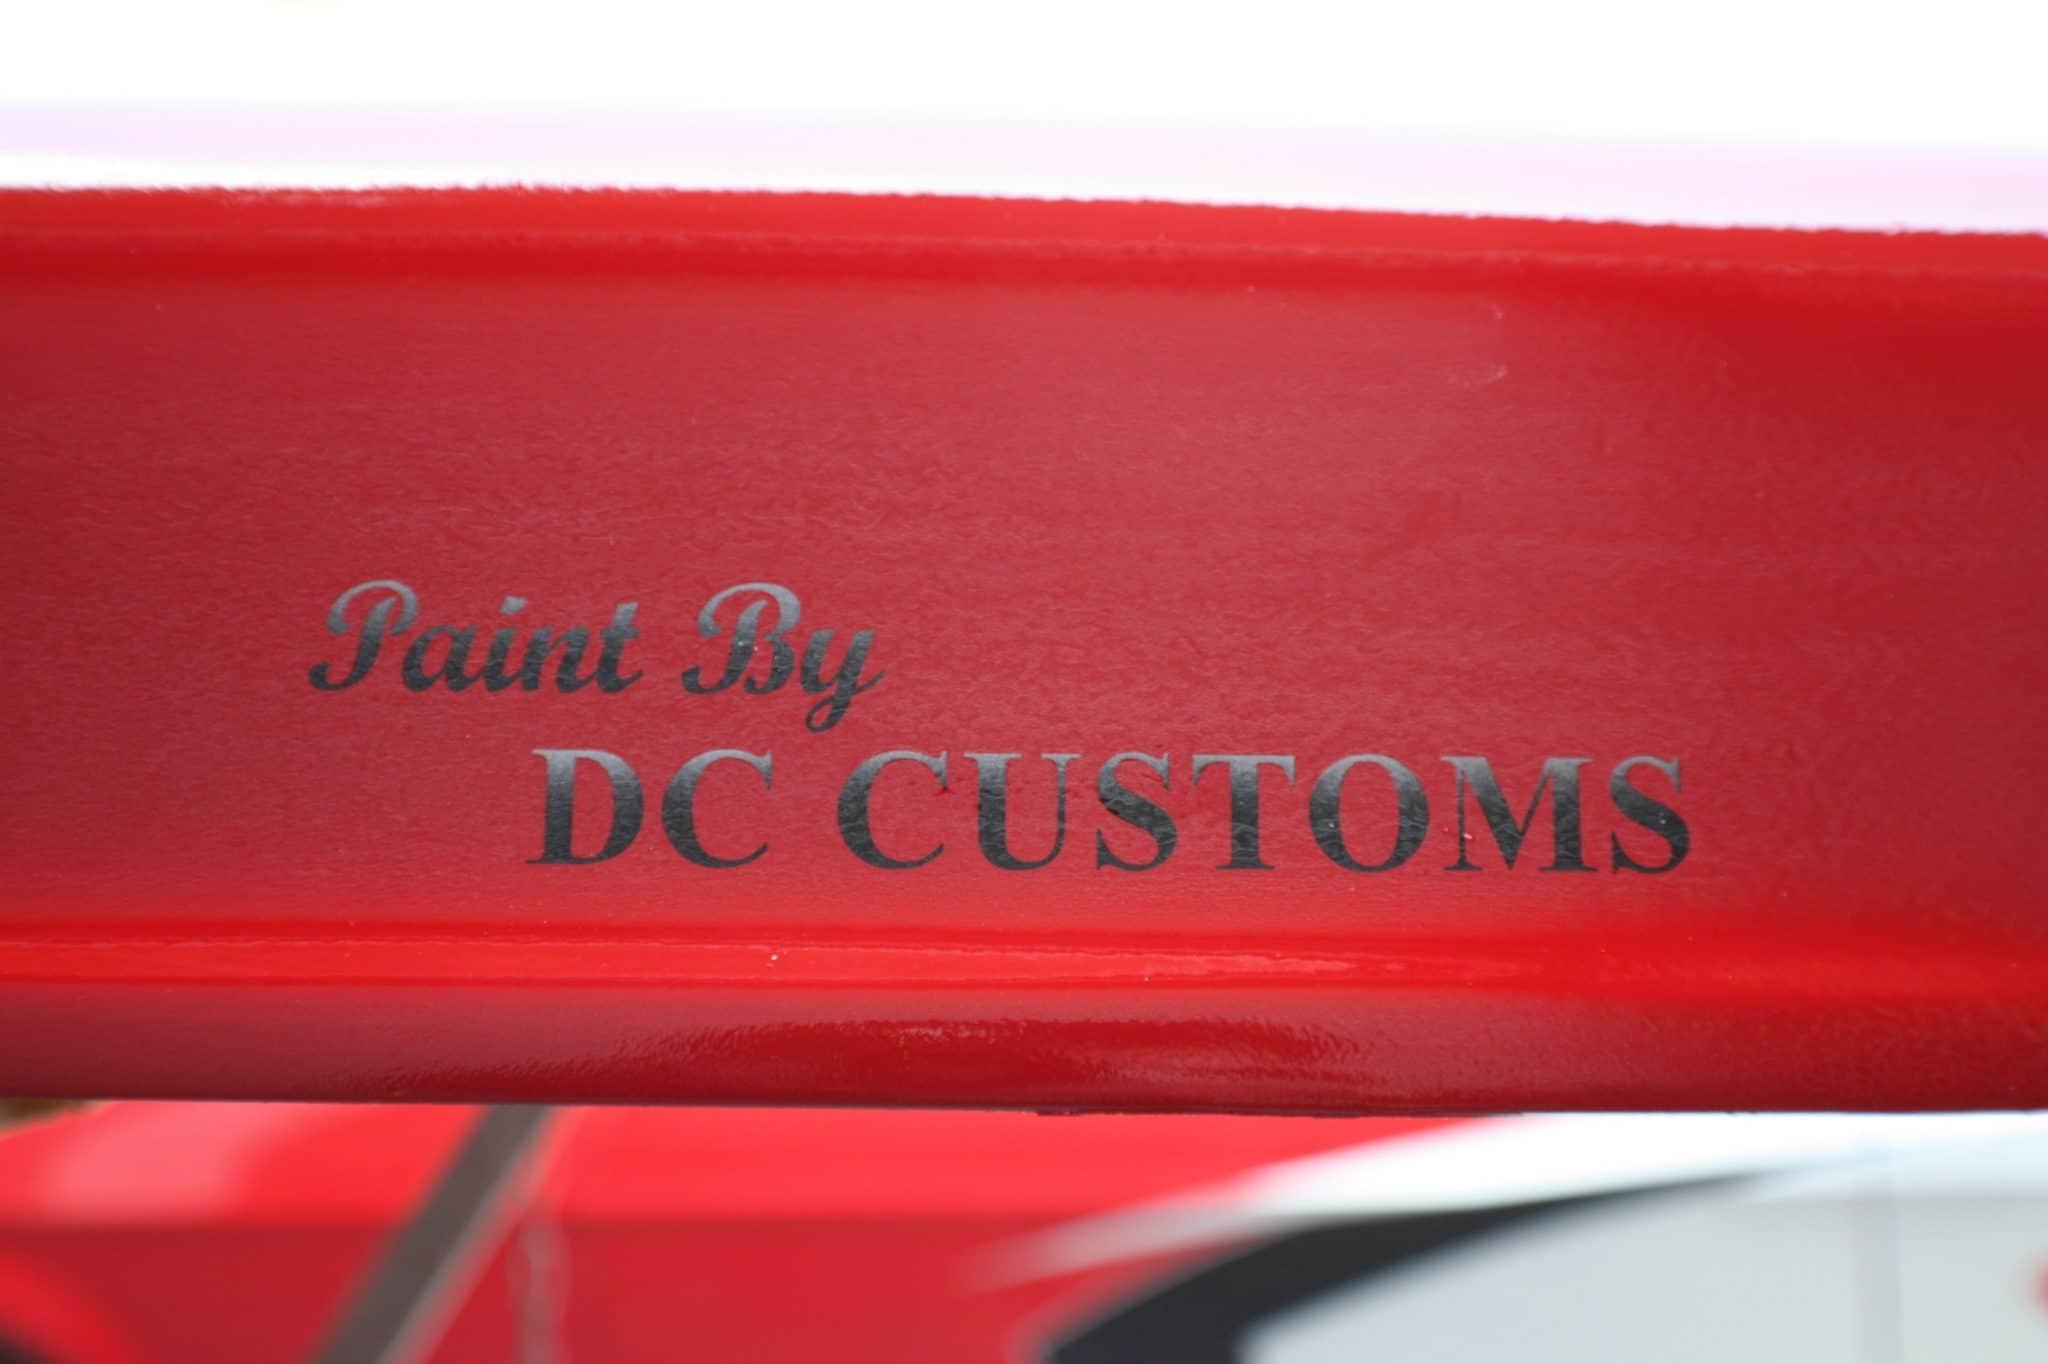 paint by dc customs logo